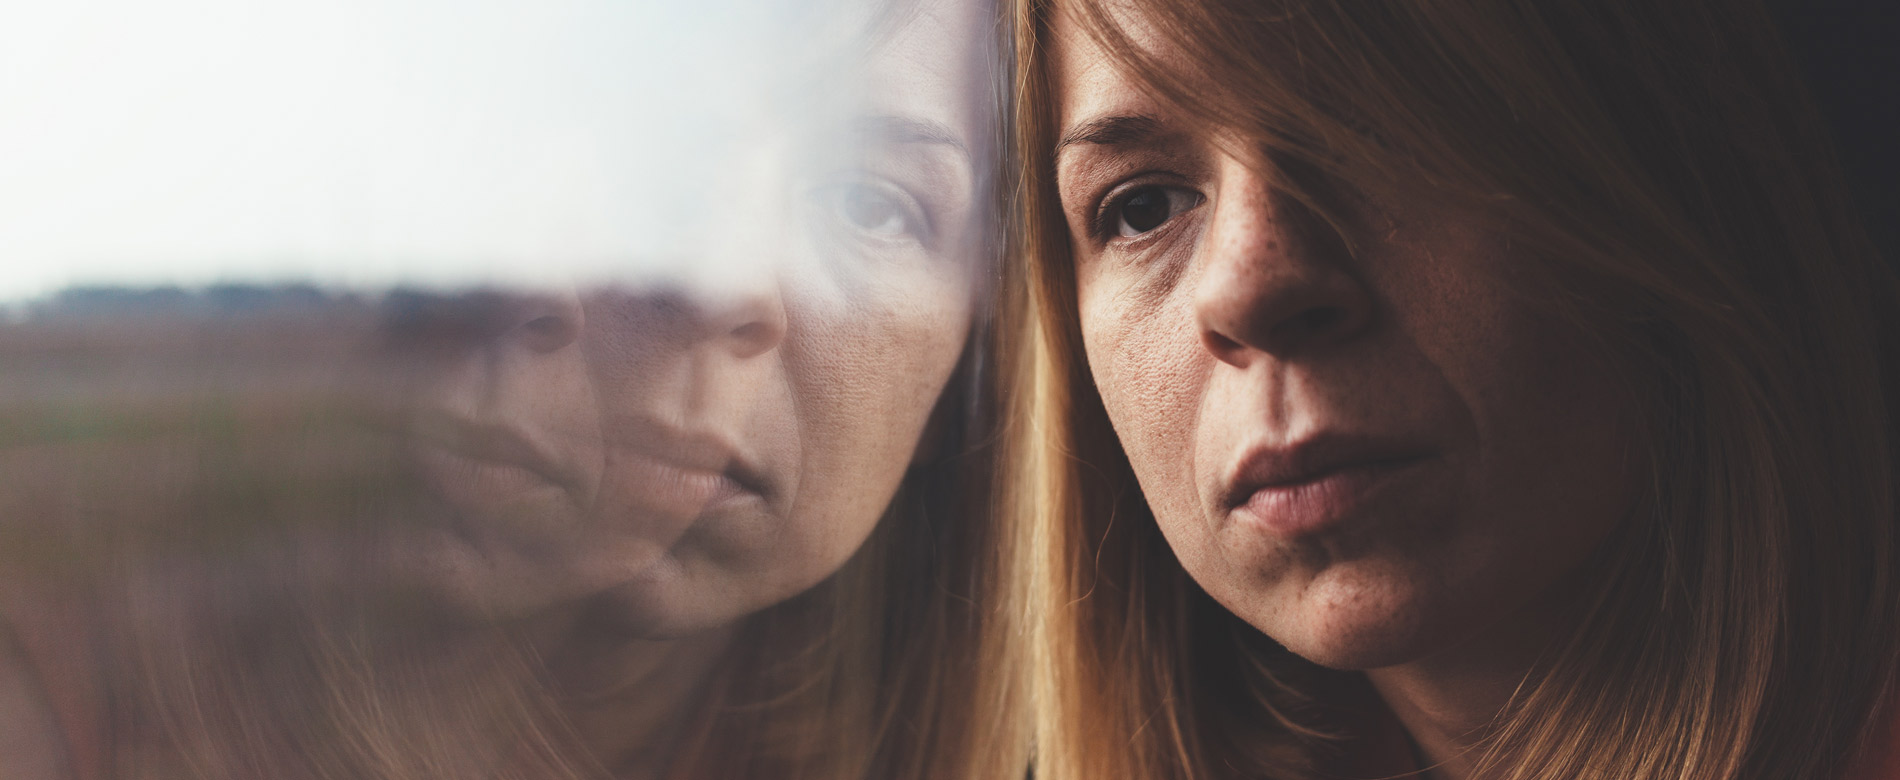 Siervas en alerta – Desasosiego del alma